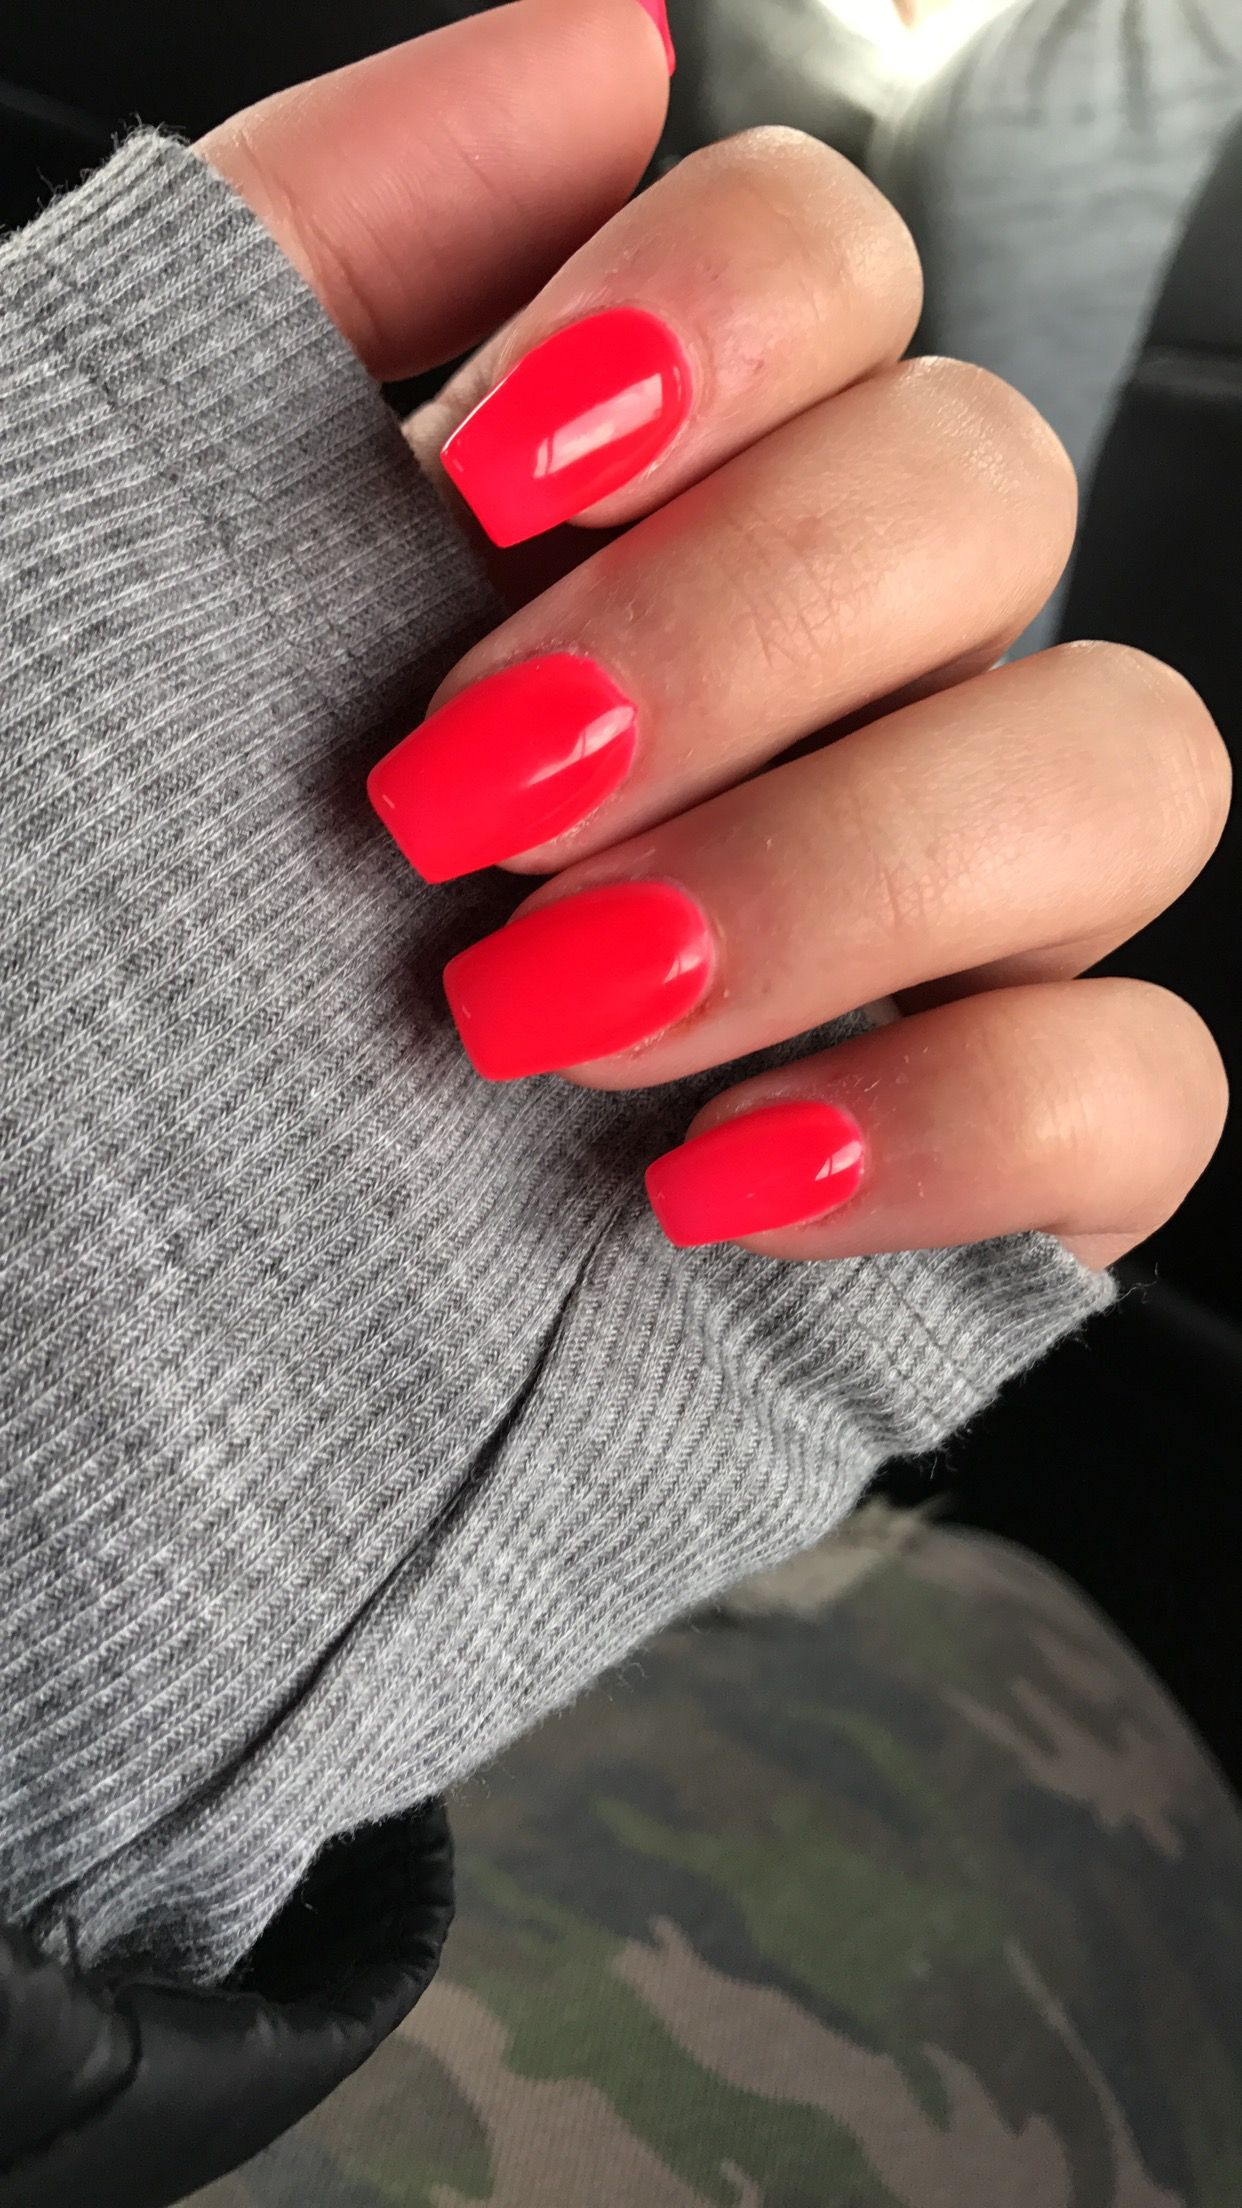 Short Coffin Acrylic Nails With Shellac Polish Summernails Acrylic Nails Short Nails Cute